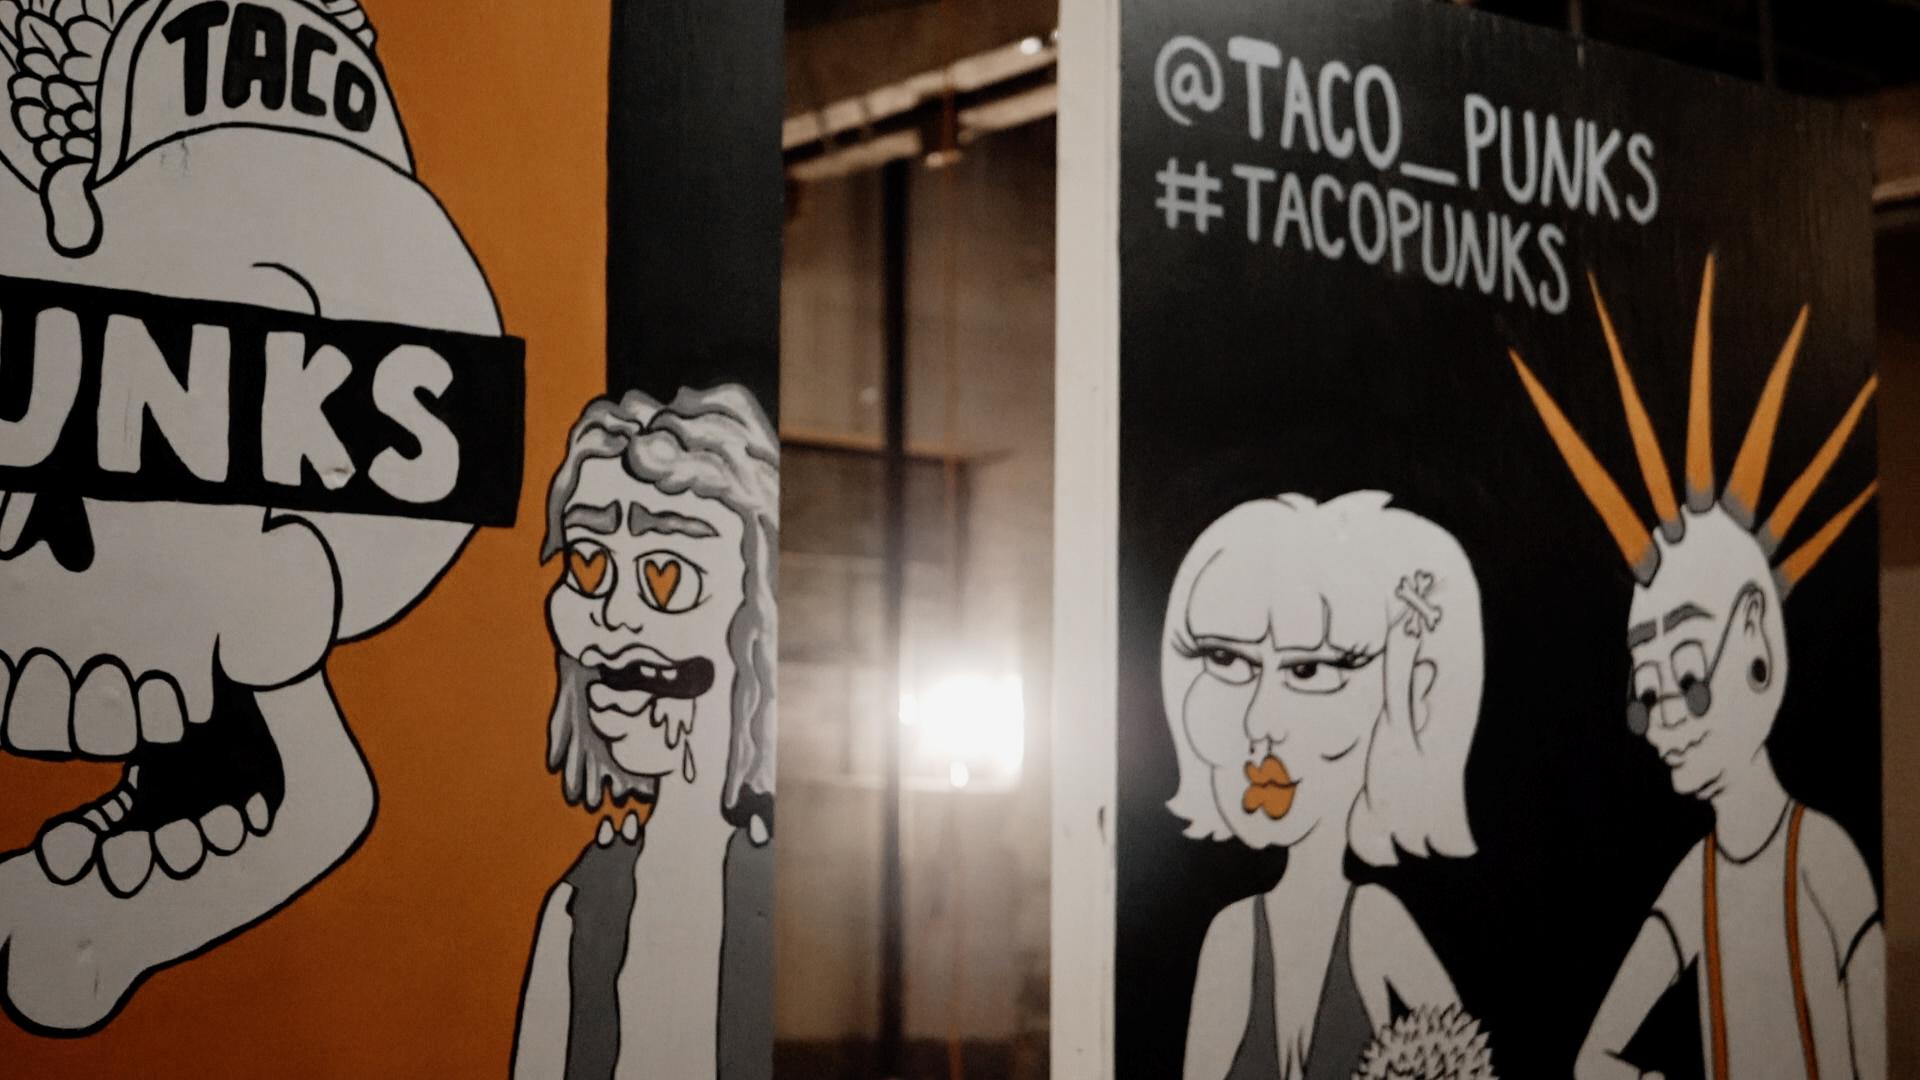 Punk-Taco-Pic5.jpg